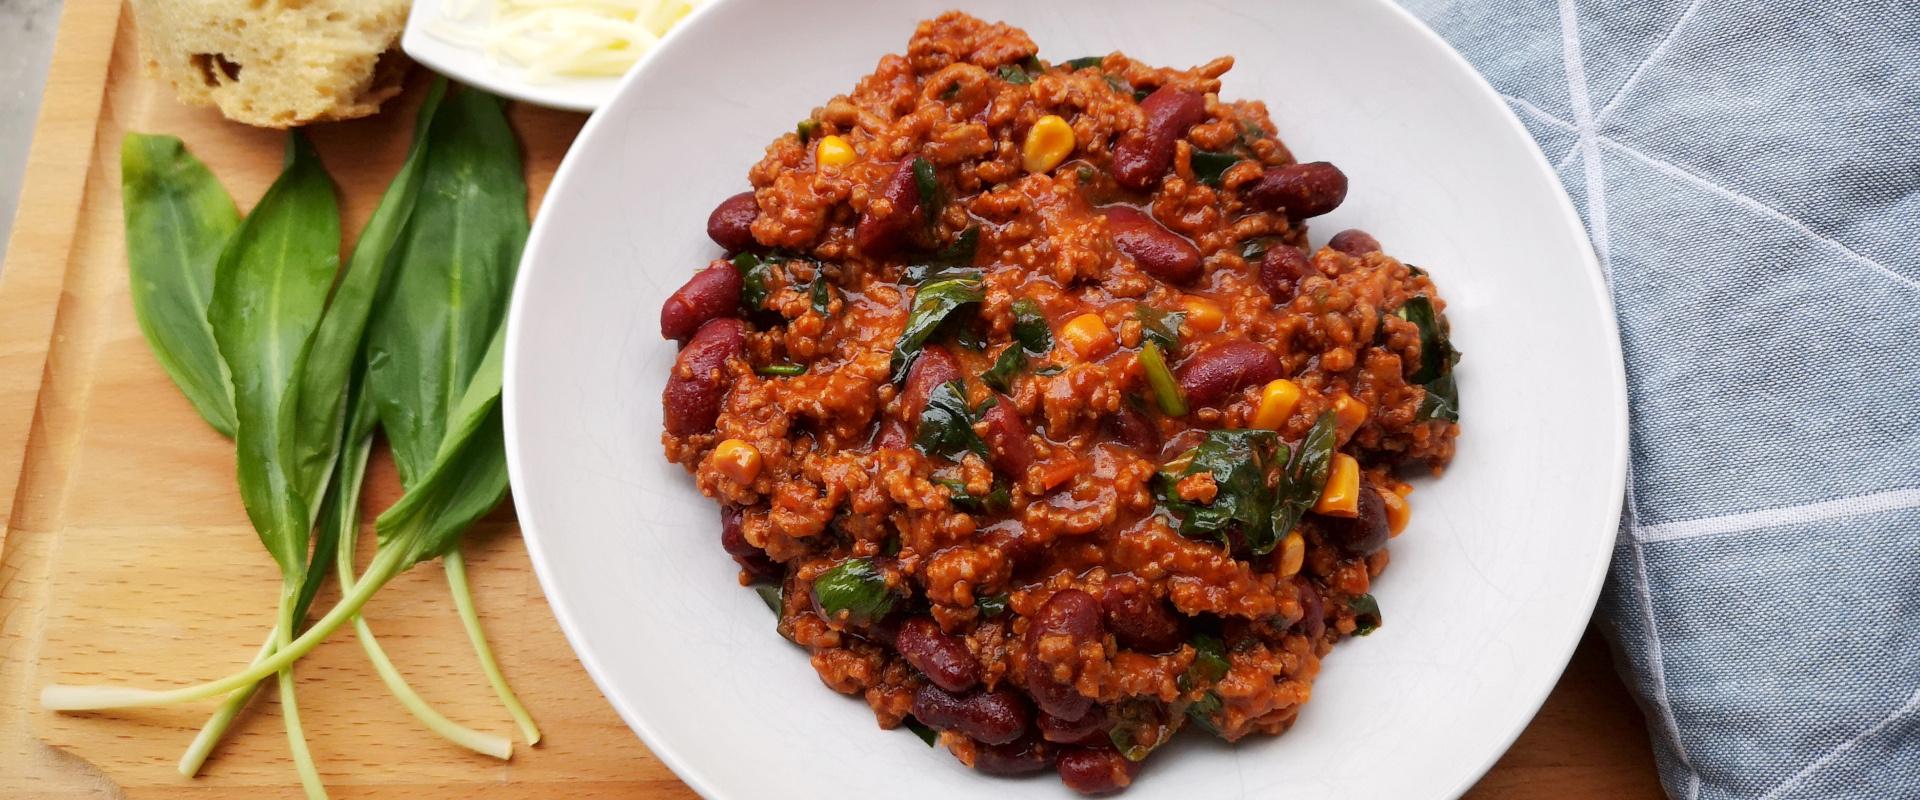 medvehagymás chilis bab cover